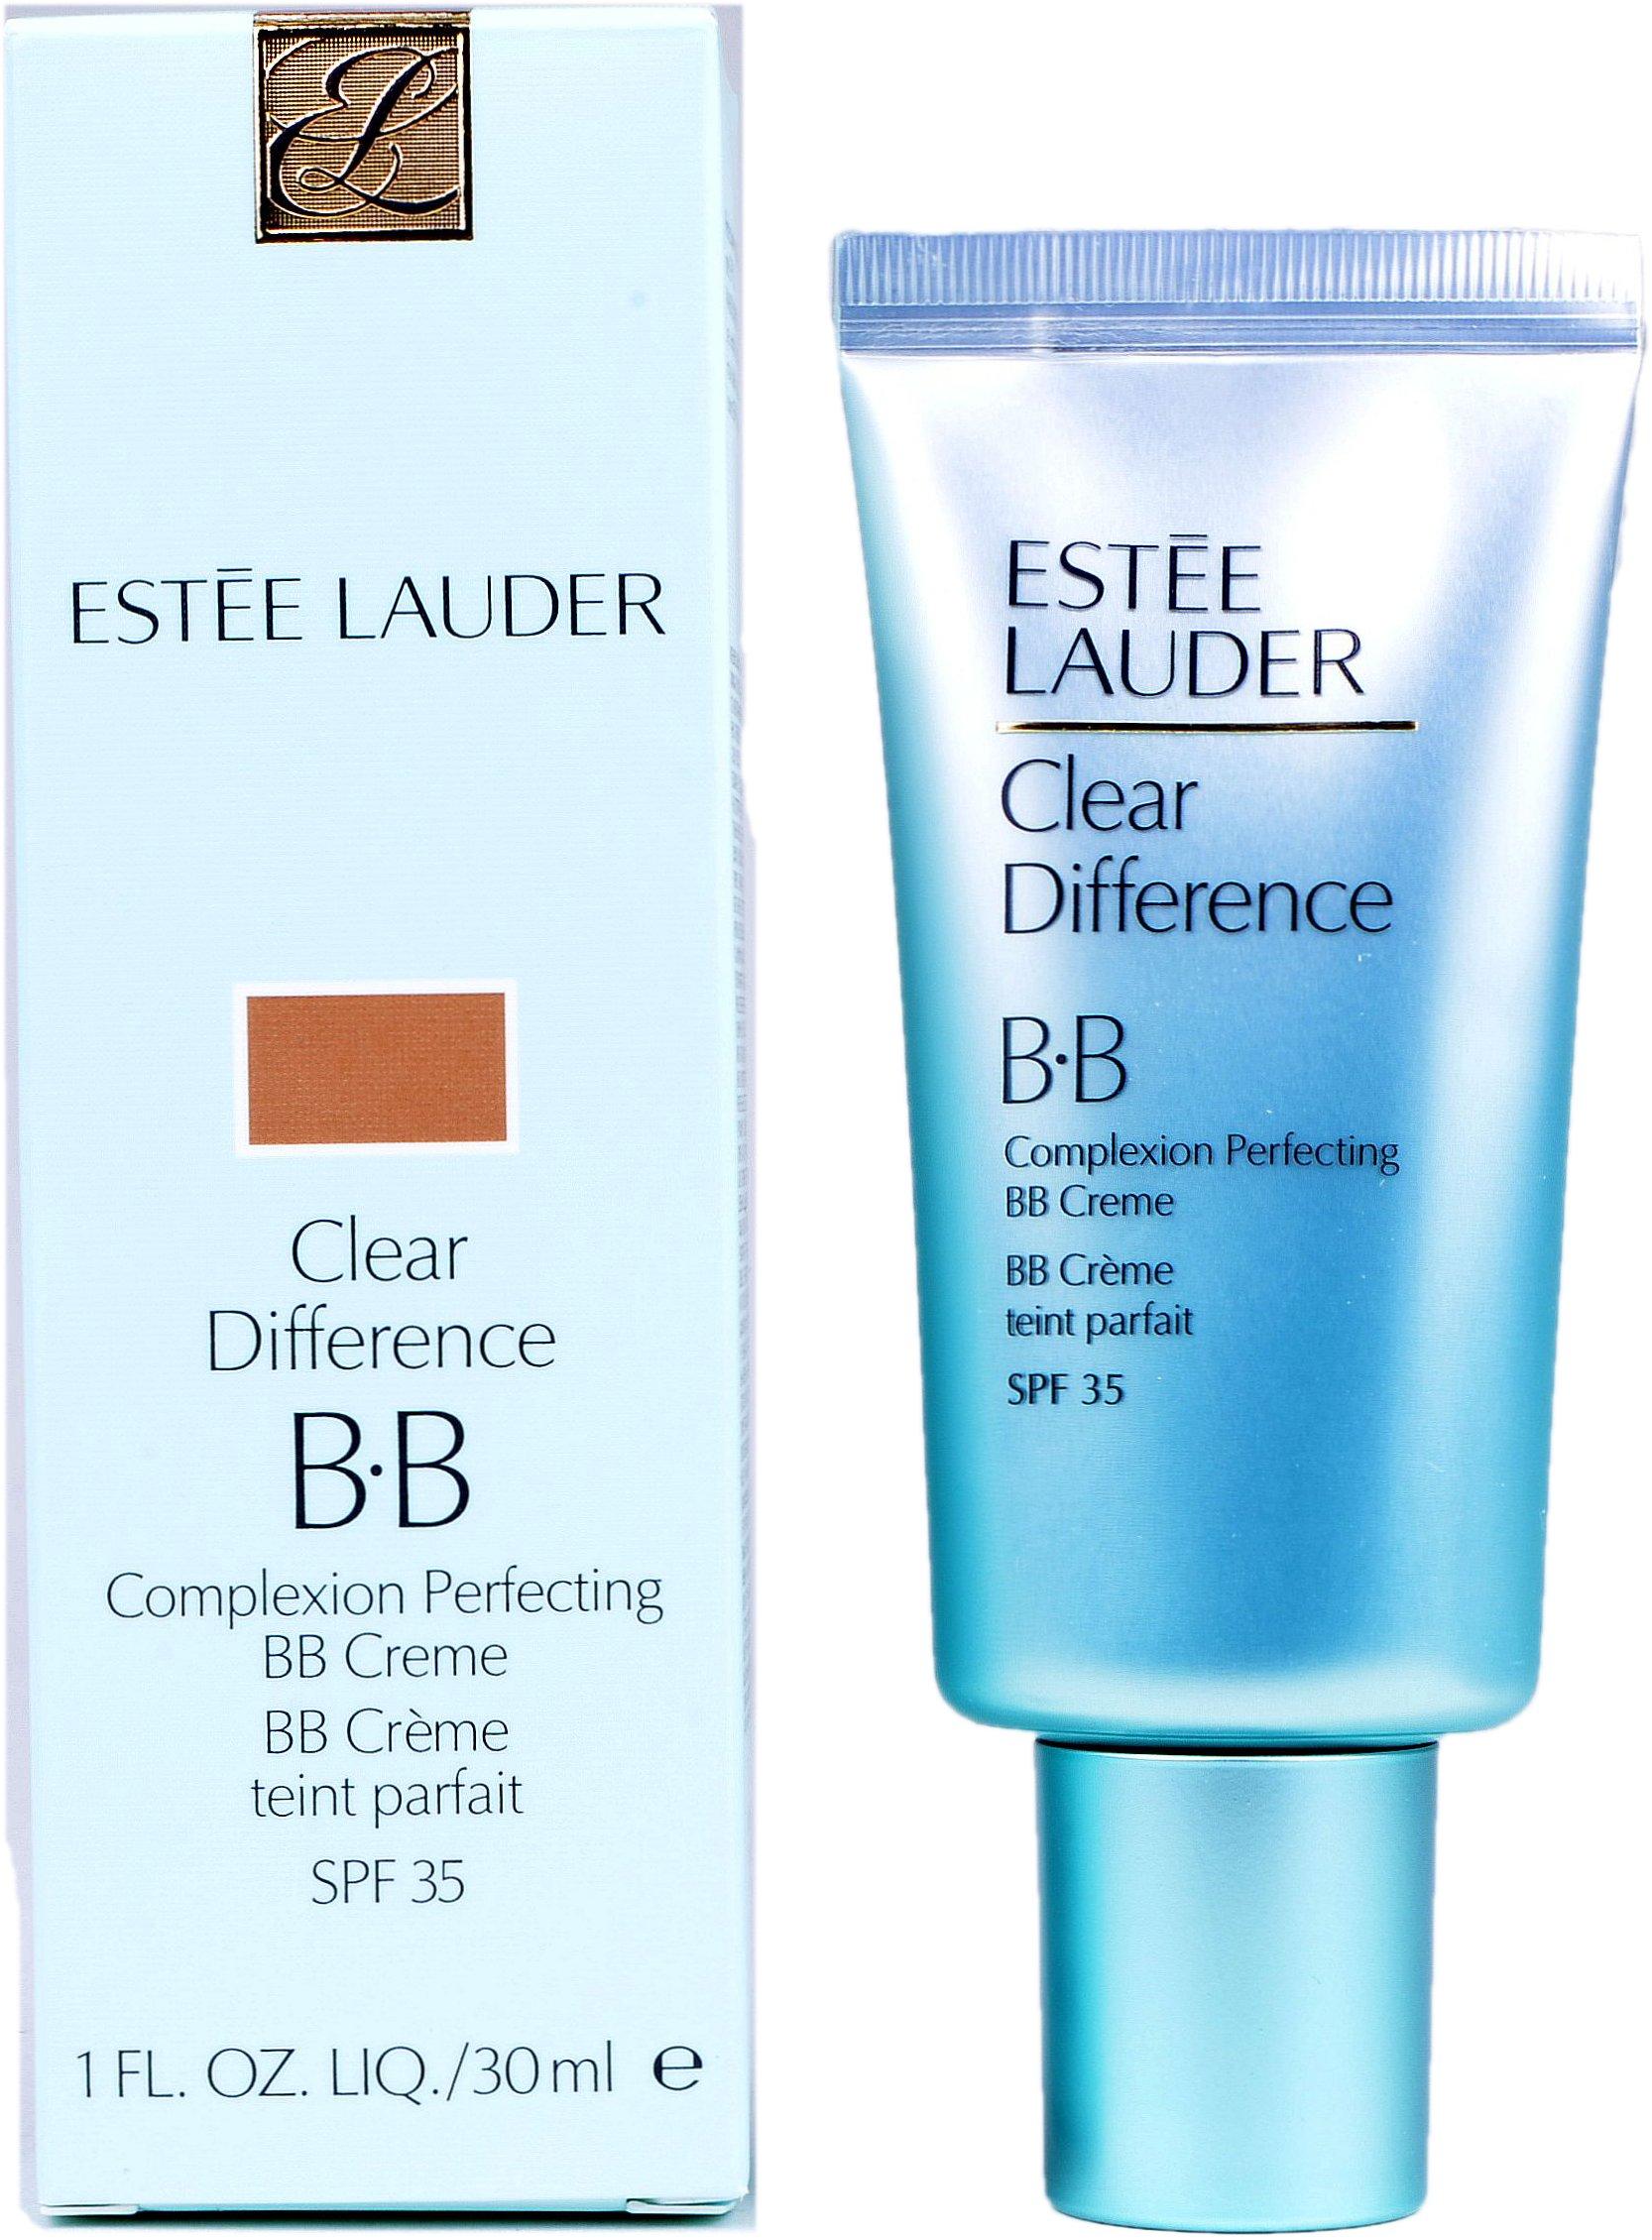 ESTEE LAUDER CLEAR DIFFERENCE BB 03 30ML KREM